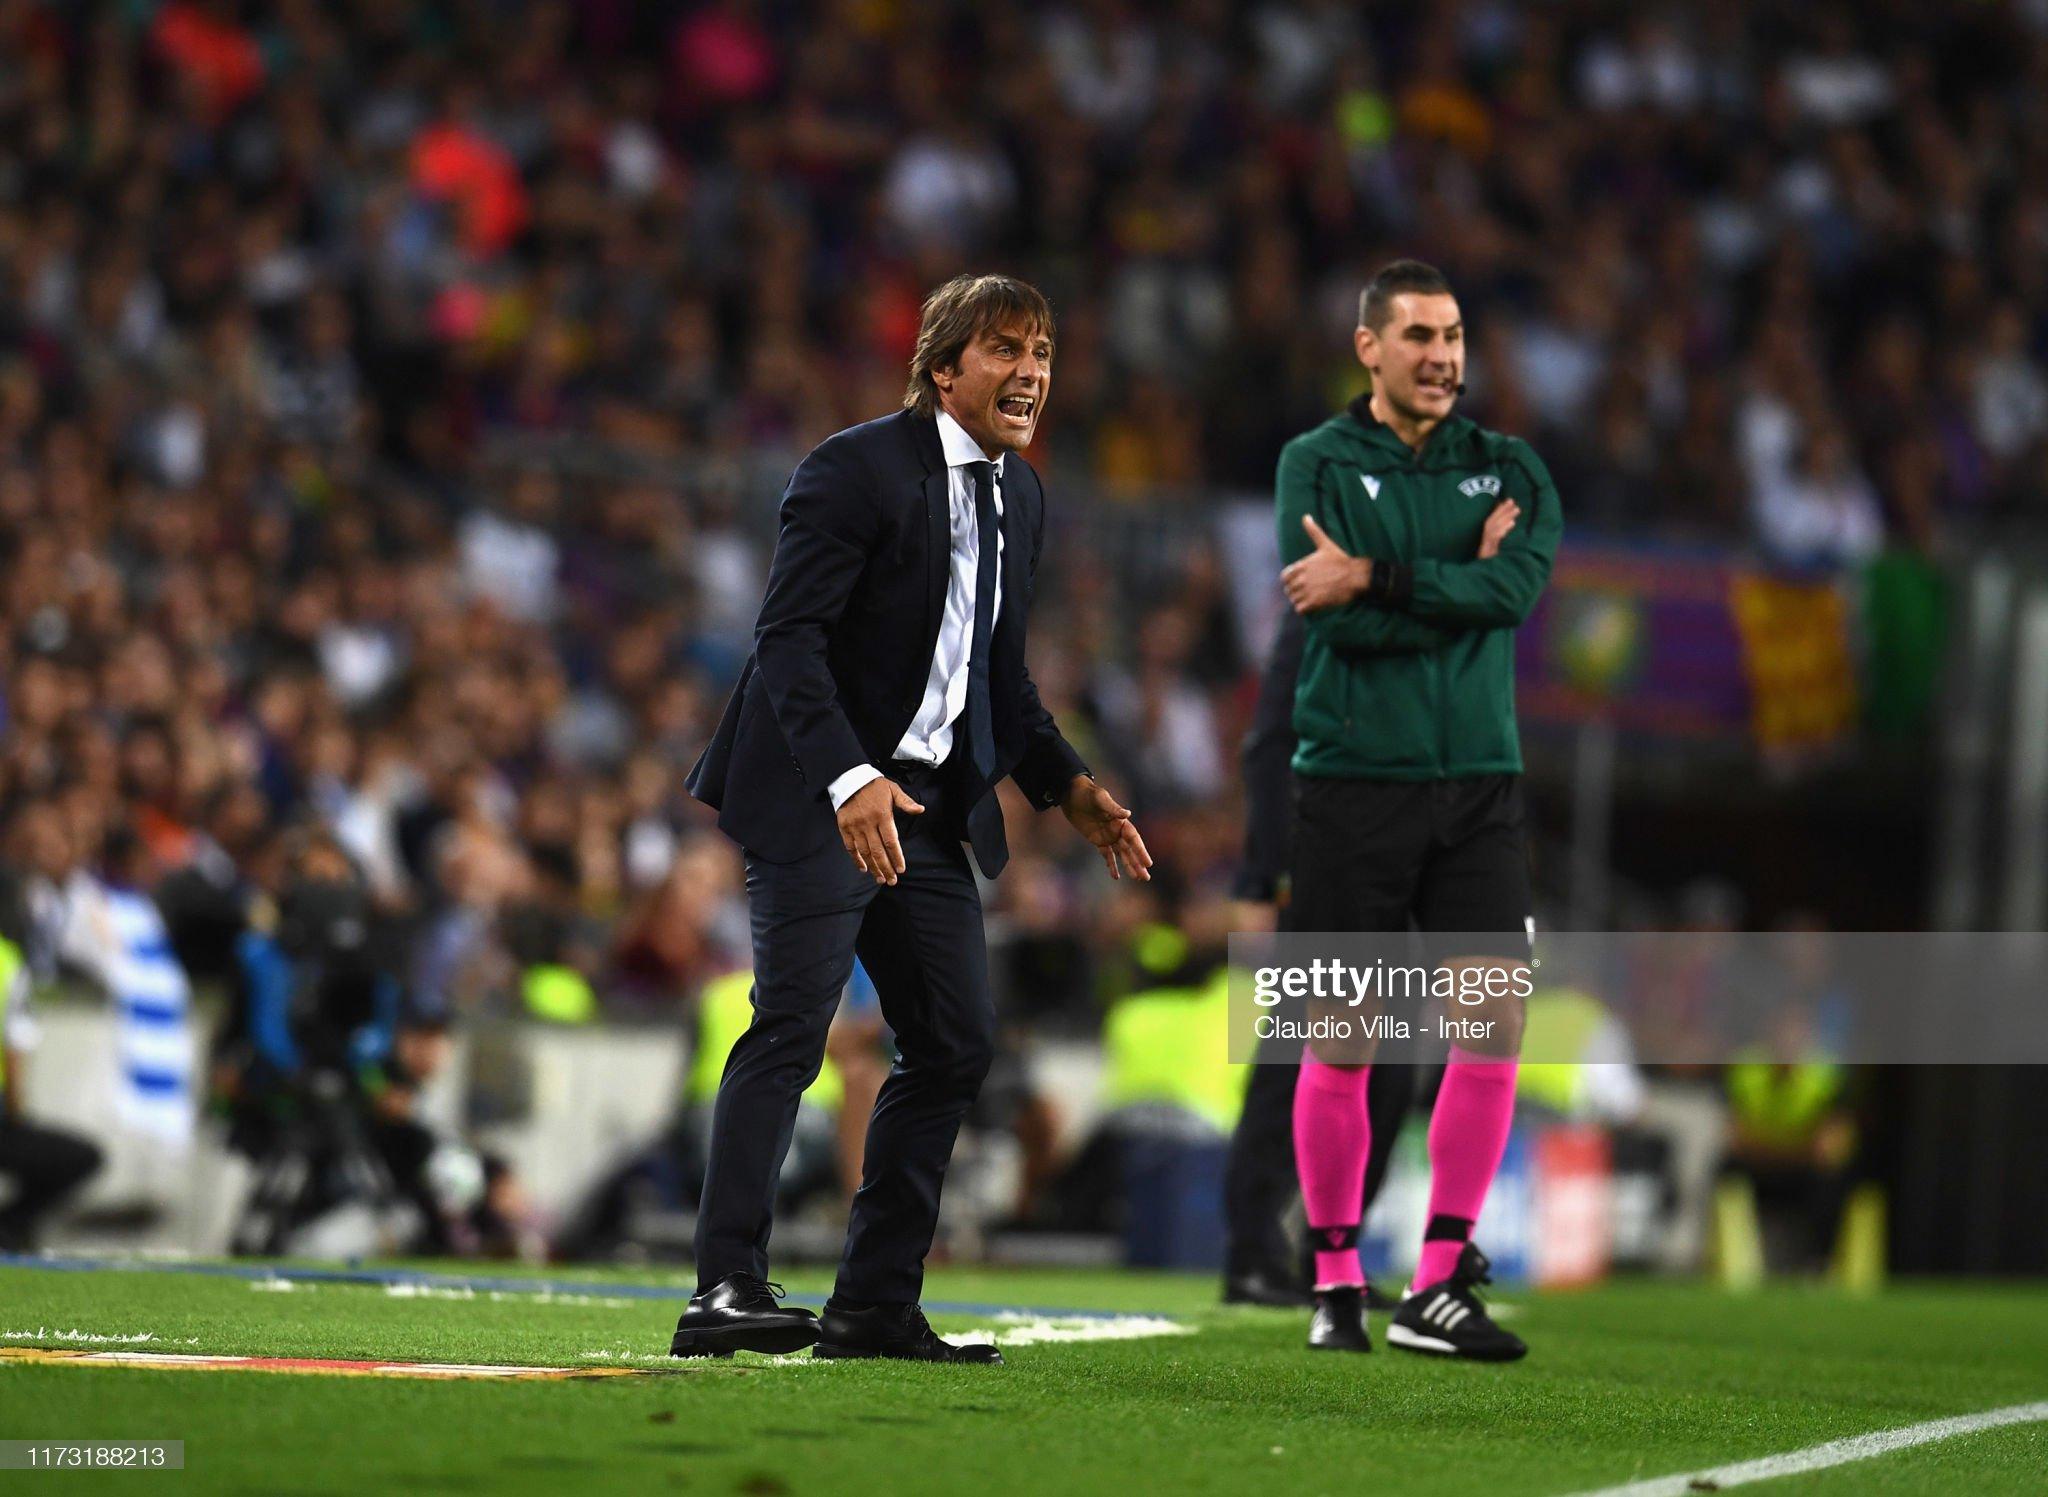 صور مباراة : برشلونة - إنتر 2-1 ( 02-10-2019 )  Head-coach-fc-internazionale-antonio-conte-reacts-during-the-uefa-picture-id1173188213?s=2048x2048